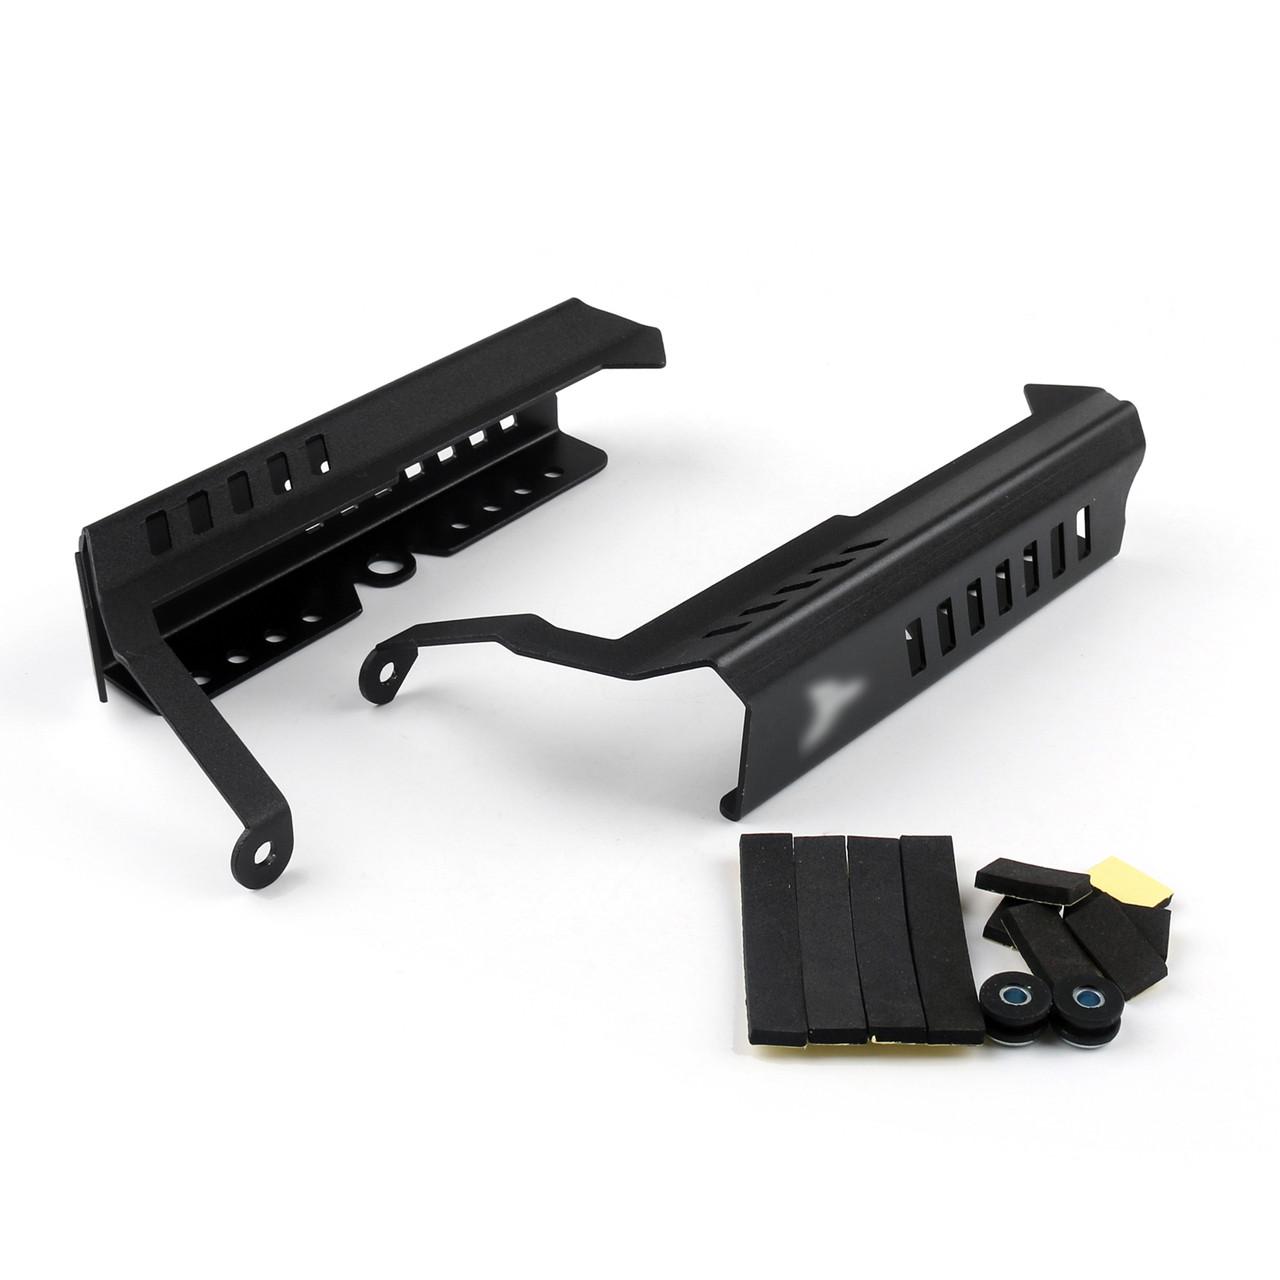 http://www.madhornets.store/AMZ/MotoPart/Radiator%20Guard/Guard-018/Guard-018-Black-1.jpg